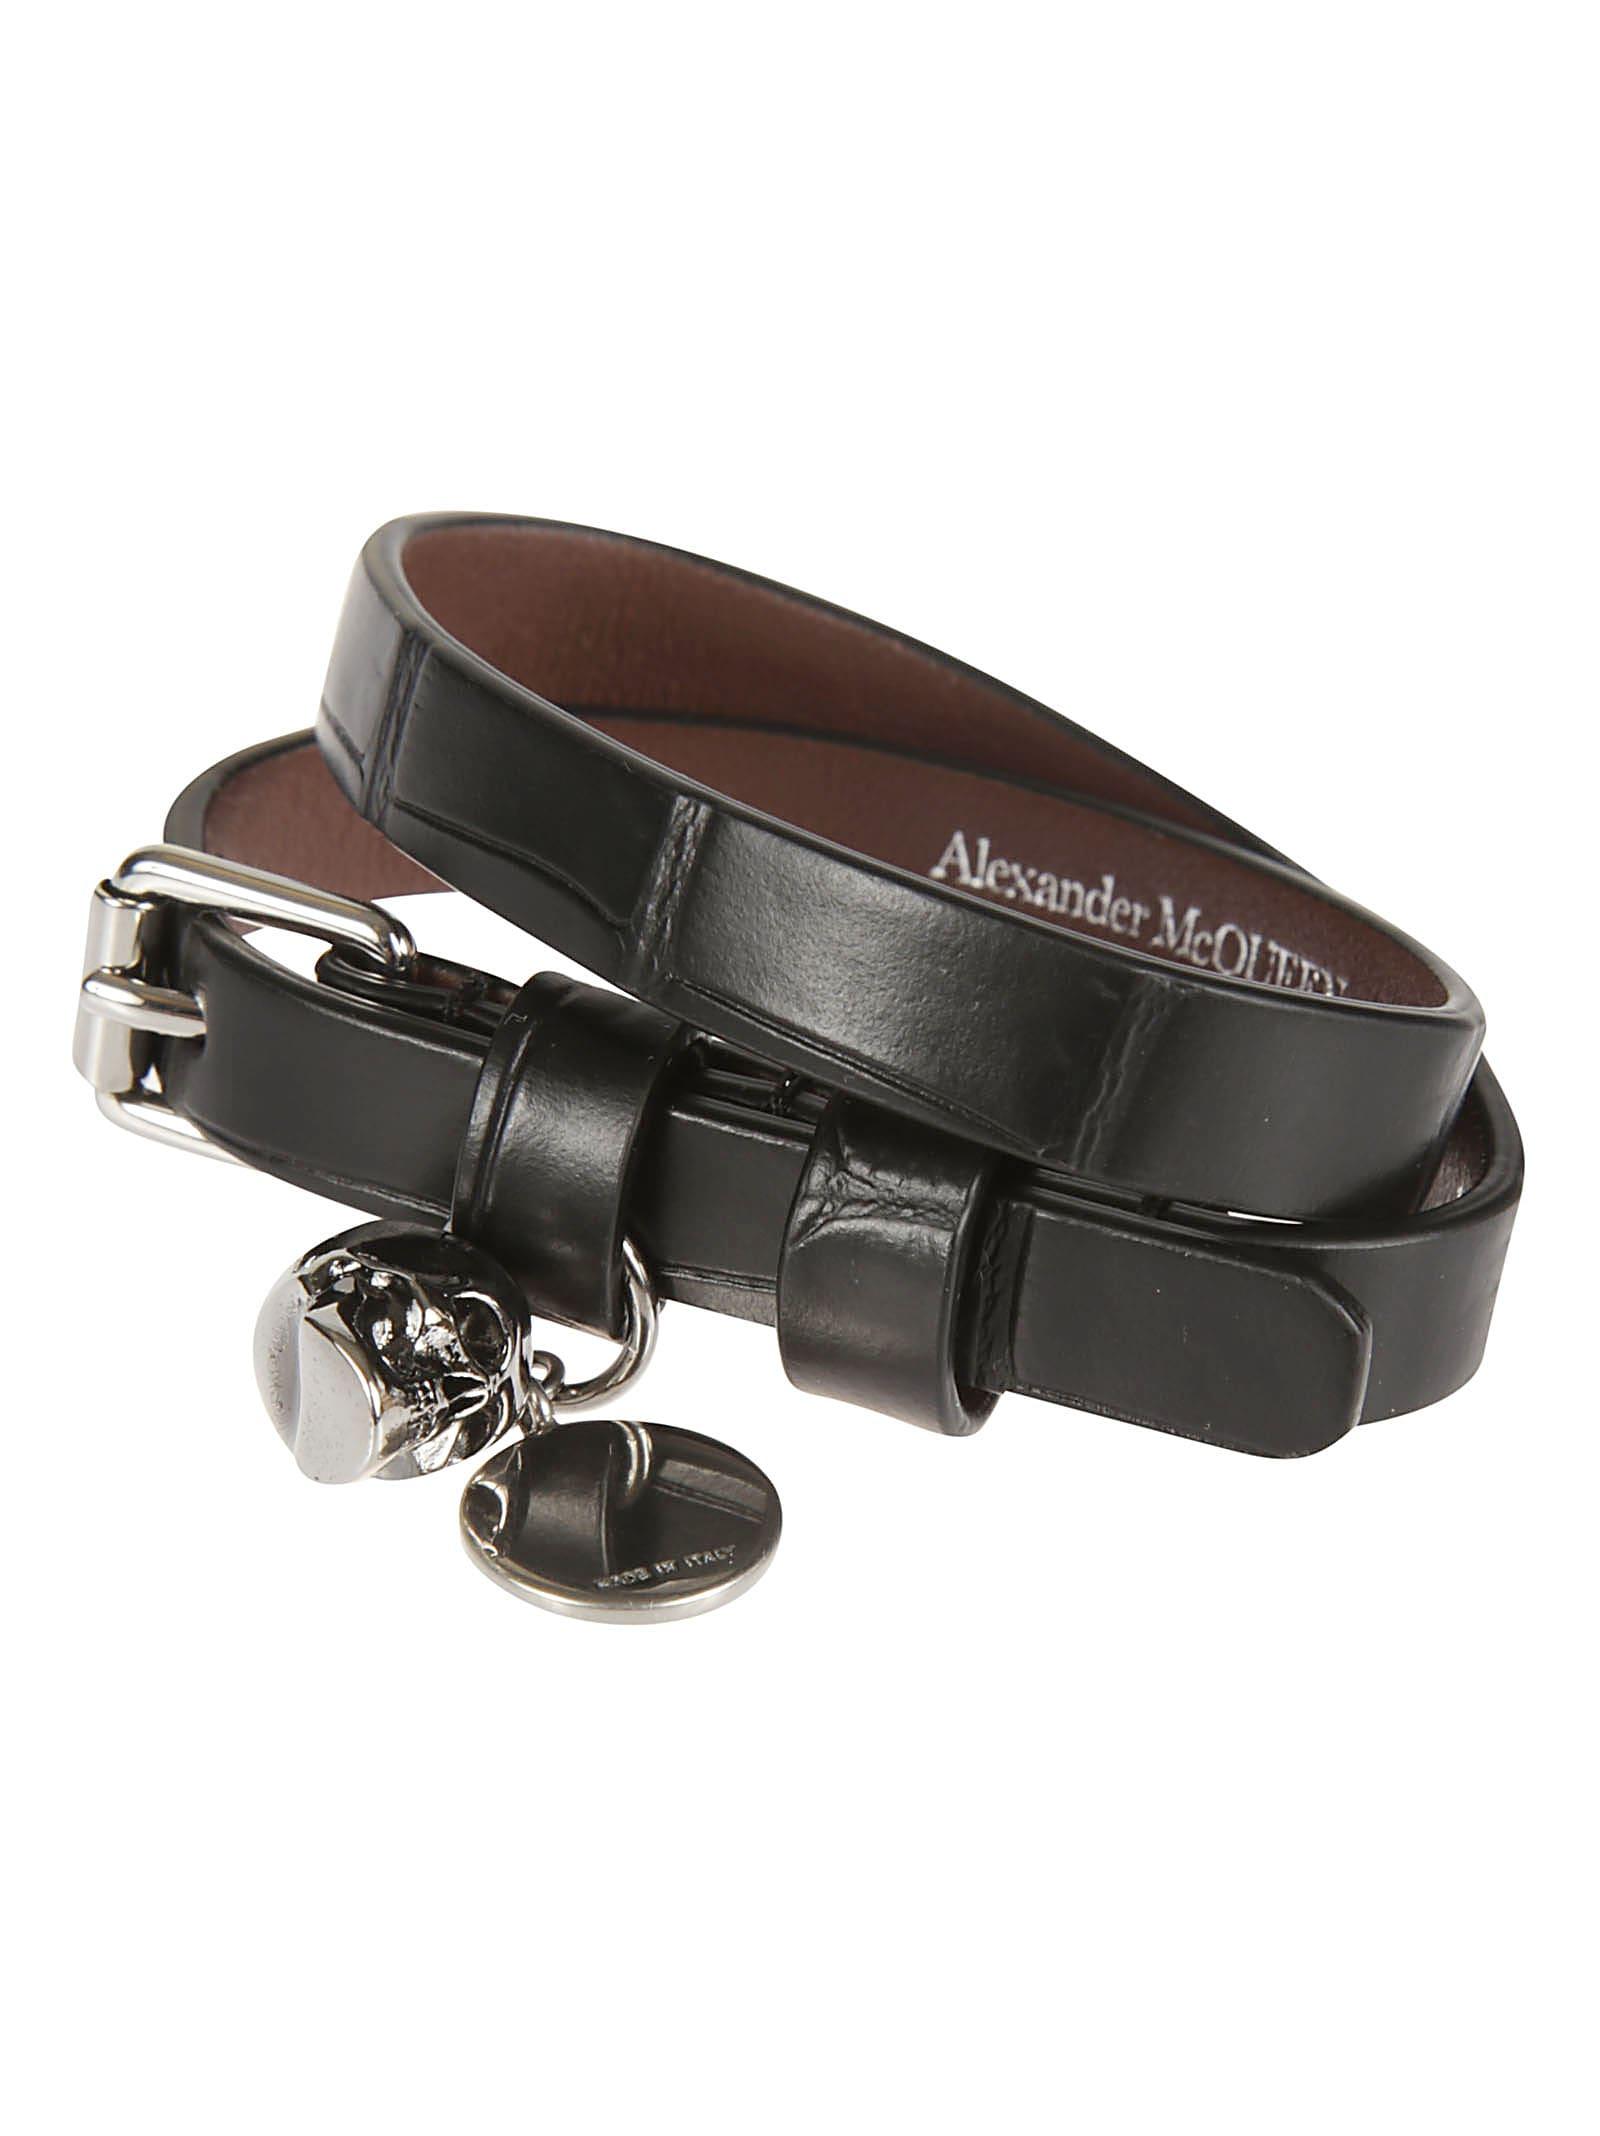 Alexander Mcqueen Double Wrap Bracelet In Black